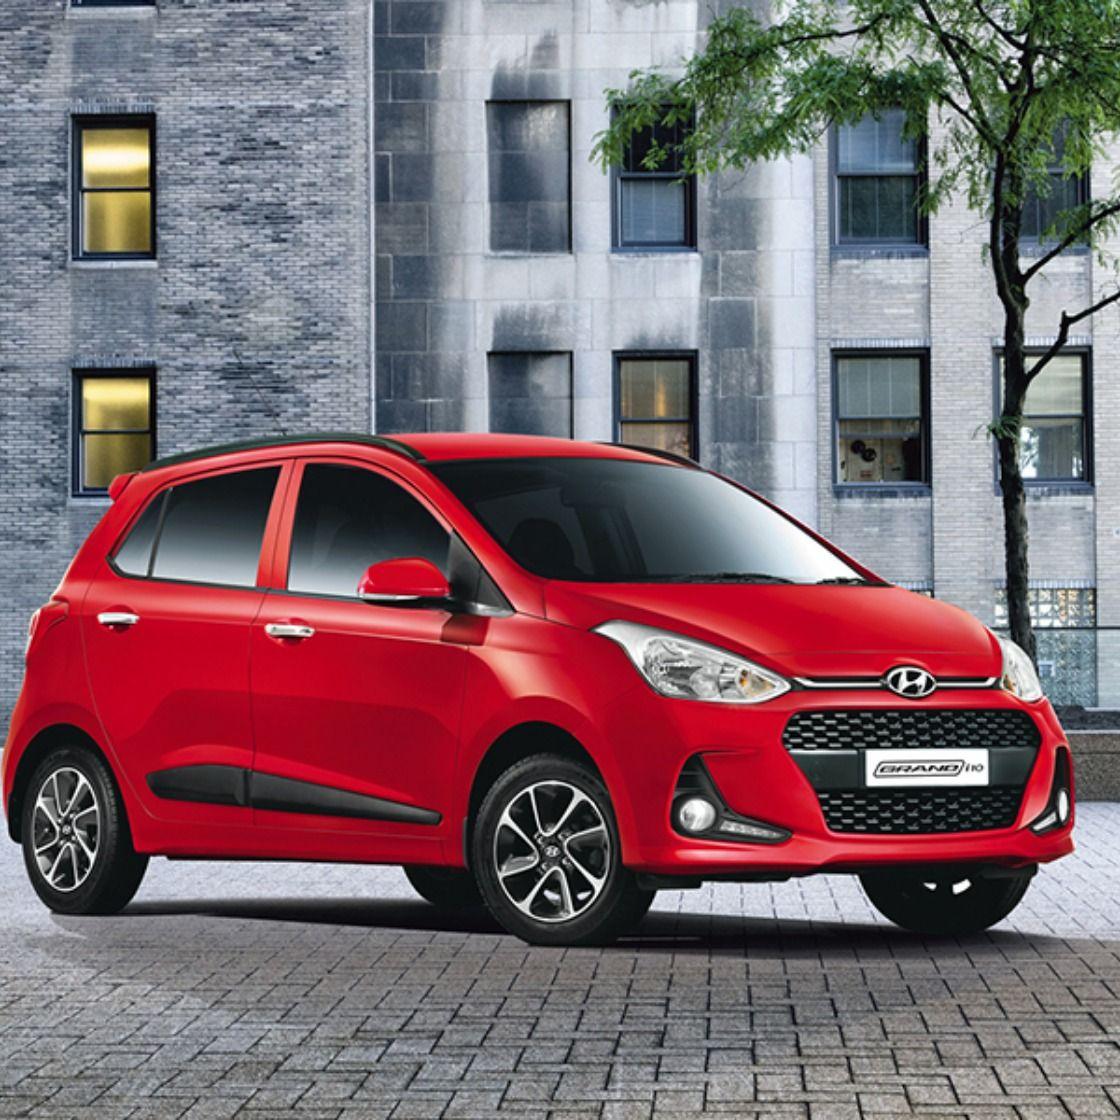 Hyundai Grand i10 New hyundai cars, Hyundai cars, New